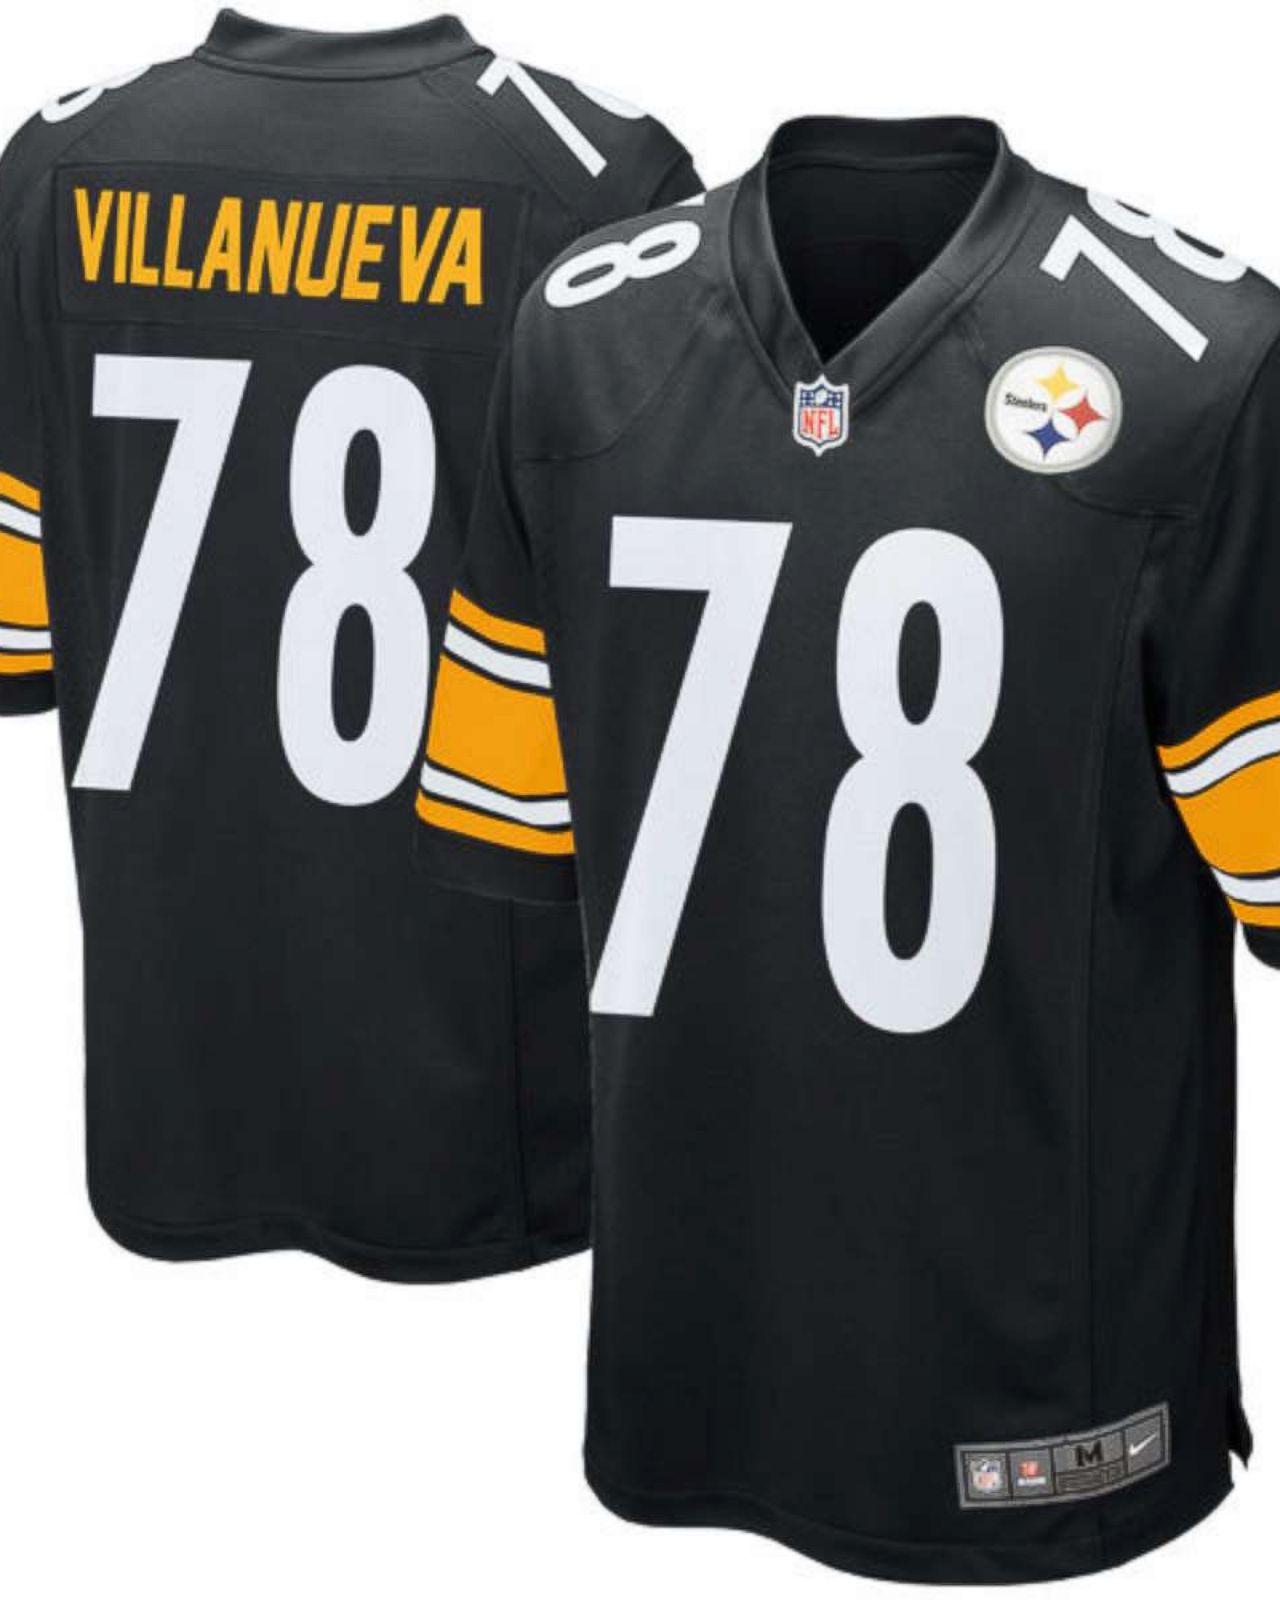 online store 693ed 3ef53 Steelers' Alejandro Villanueva donating proceeds from jersey ...